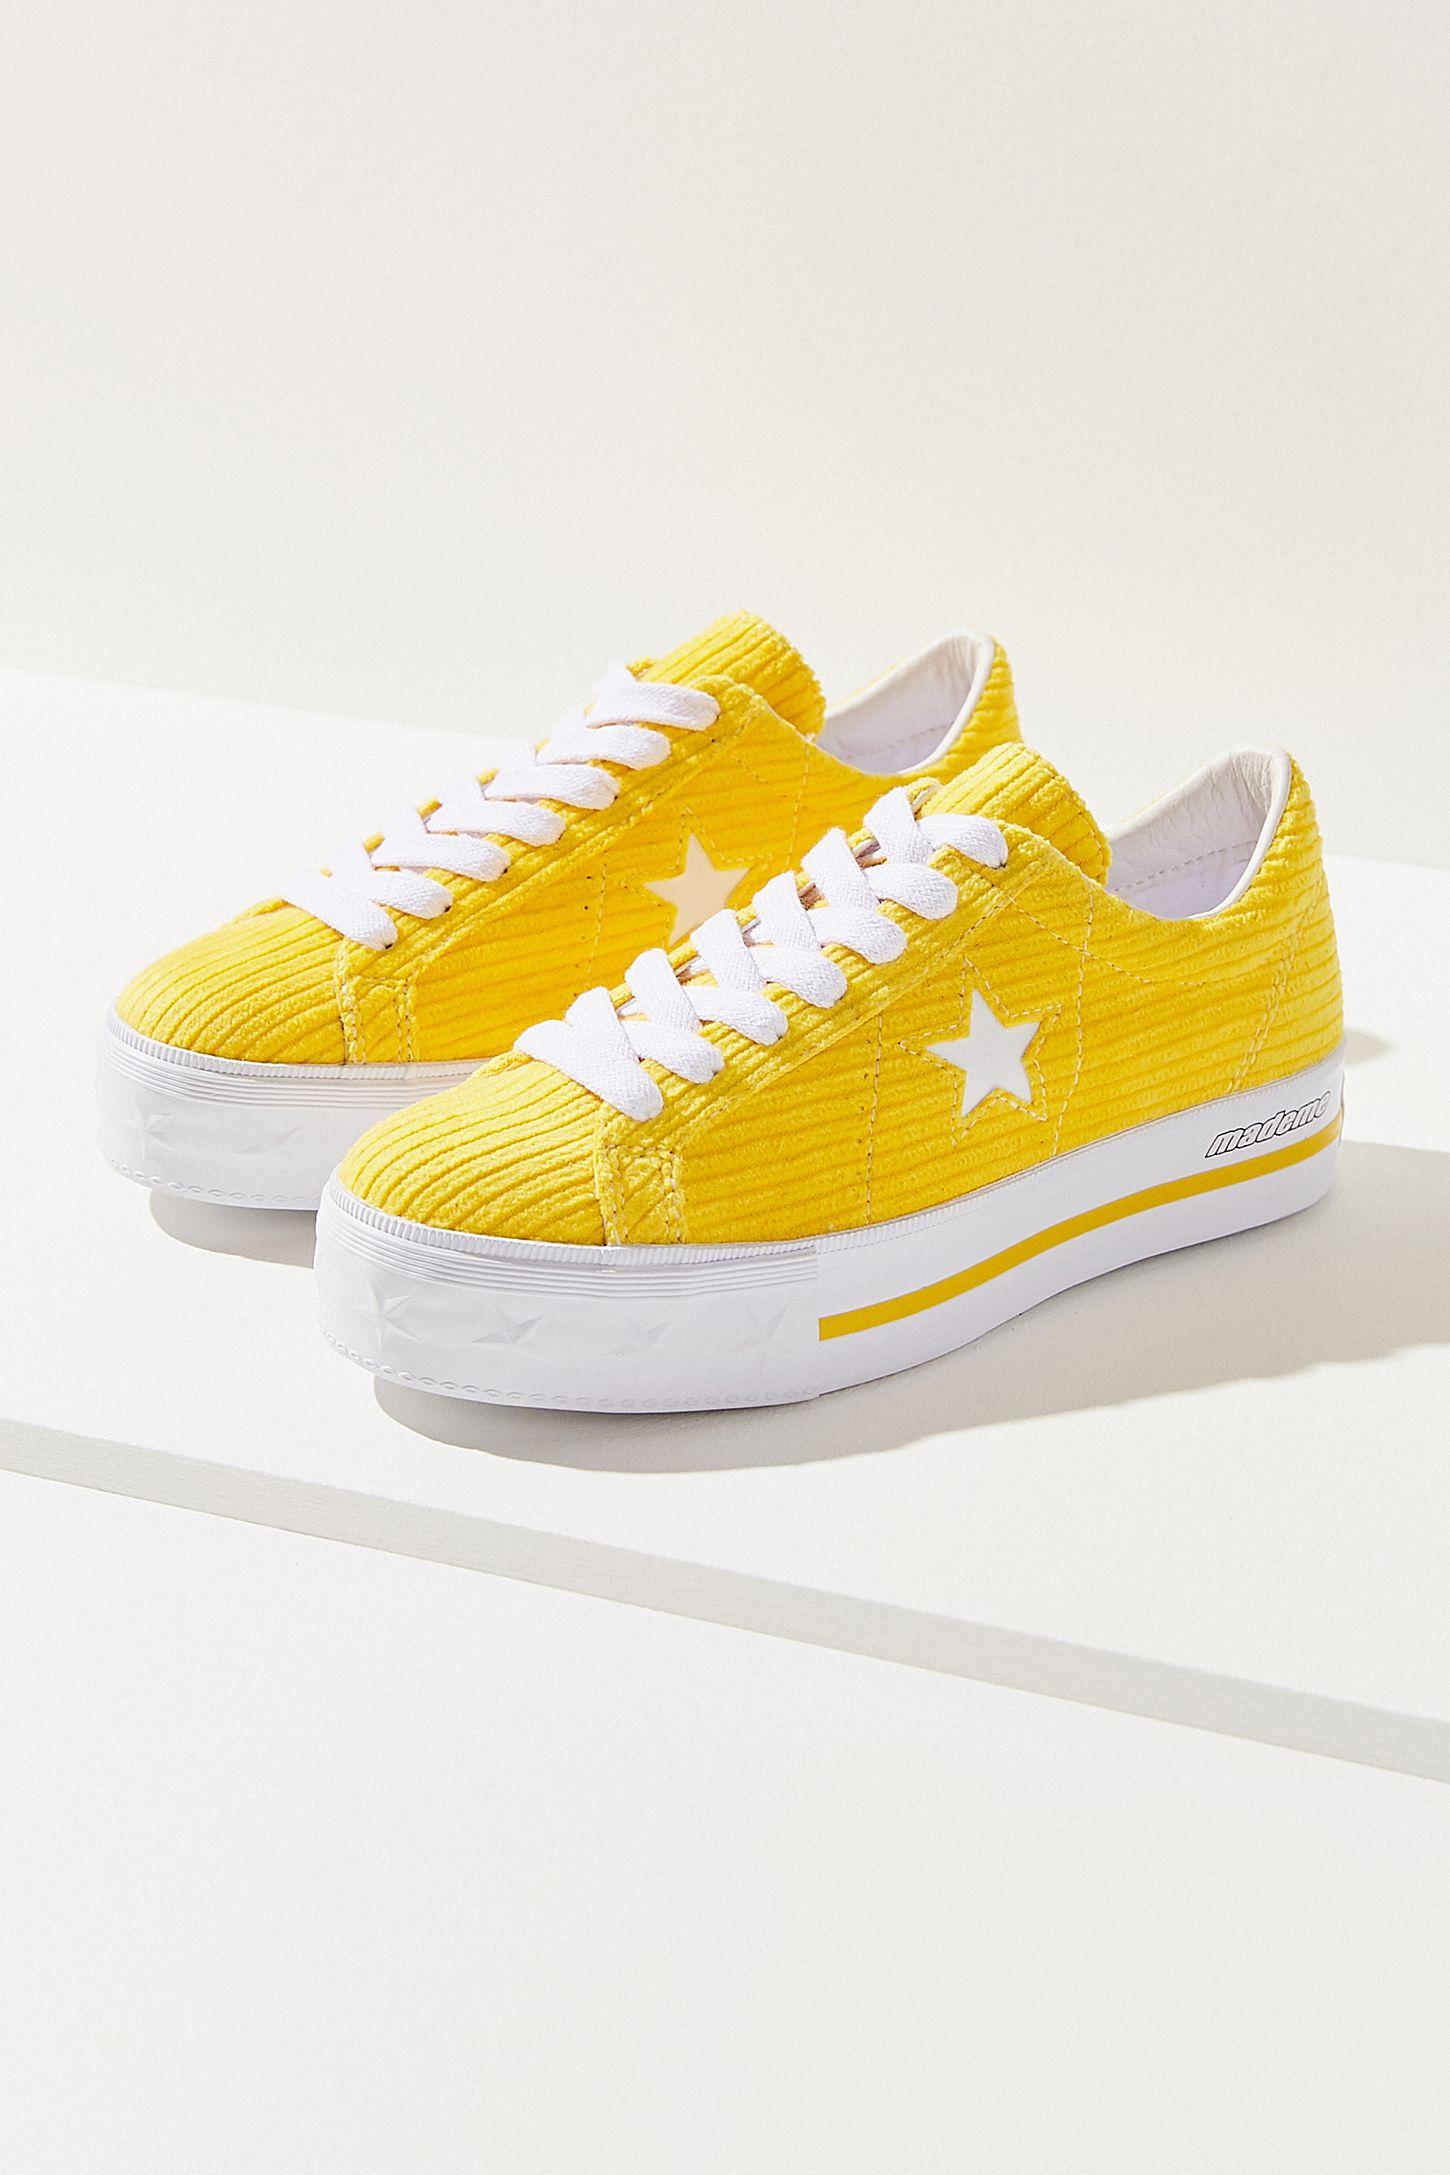 Converse One Star X MadeMe Corduroy Platform Sneaker  8d579b4e6c